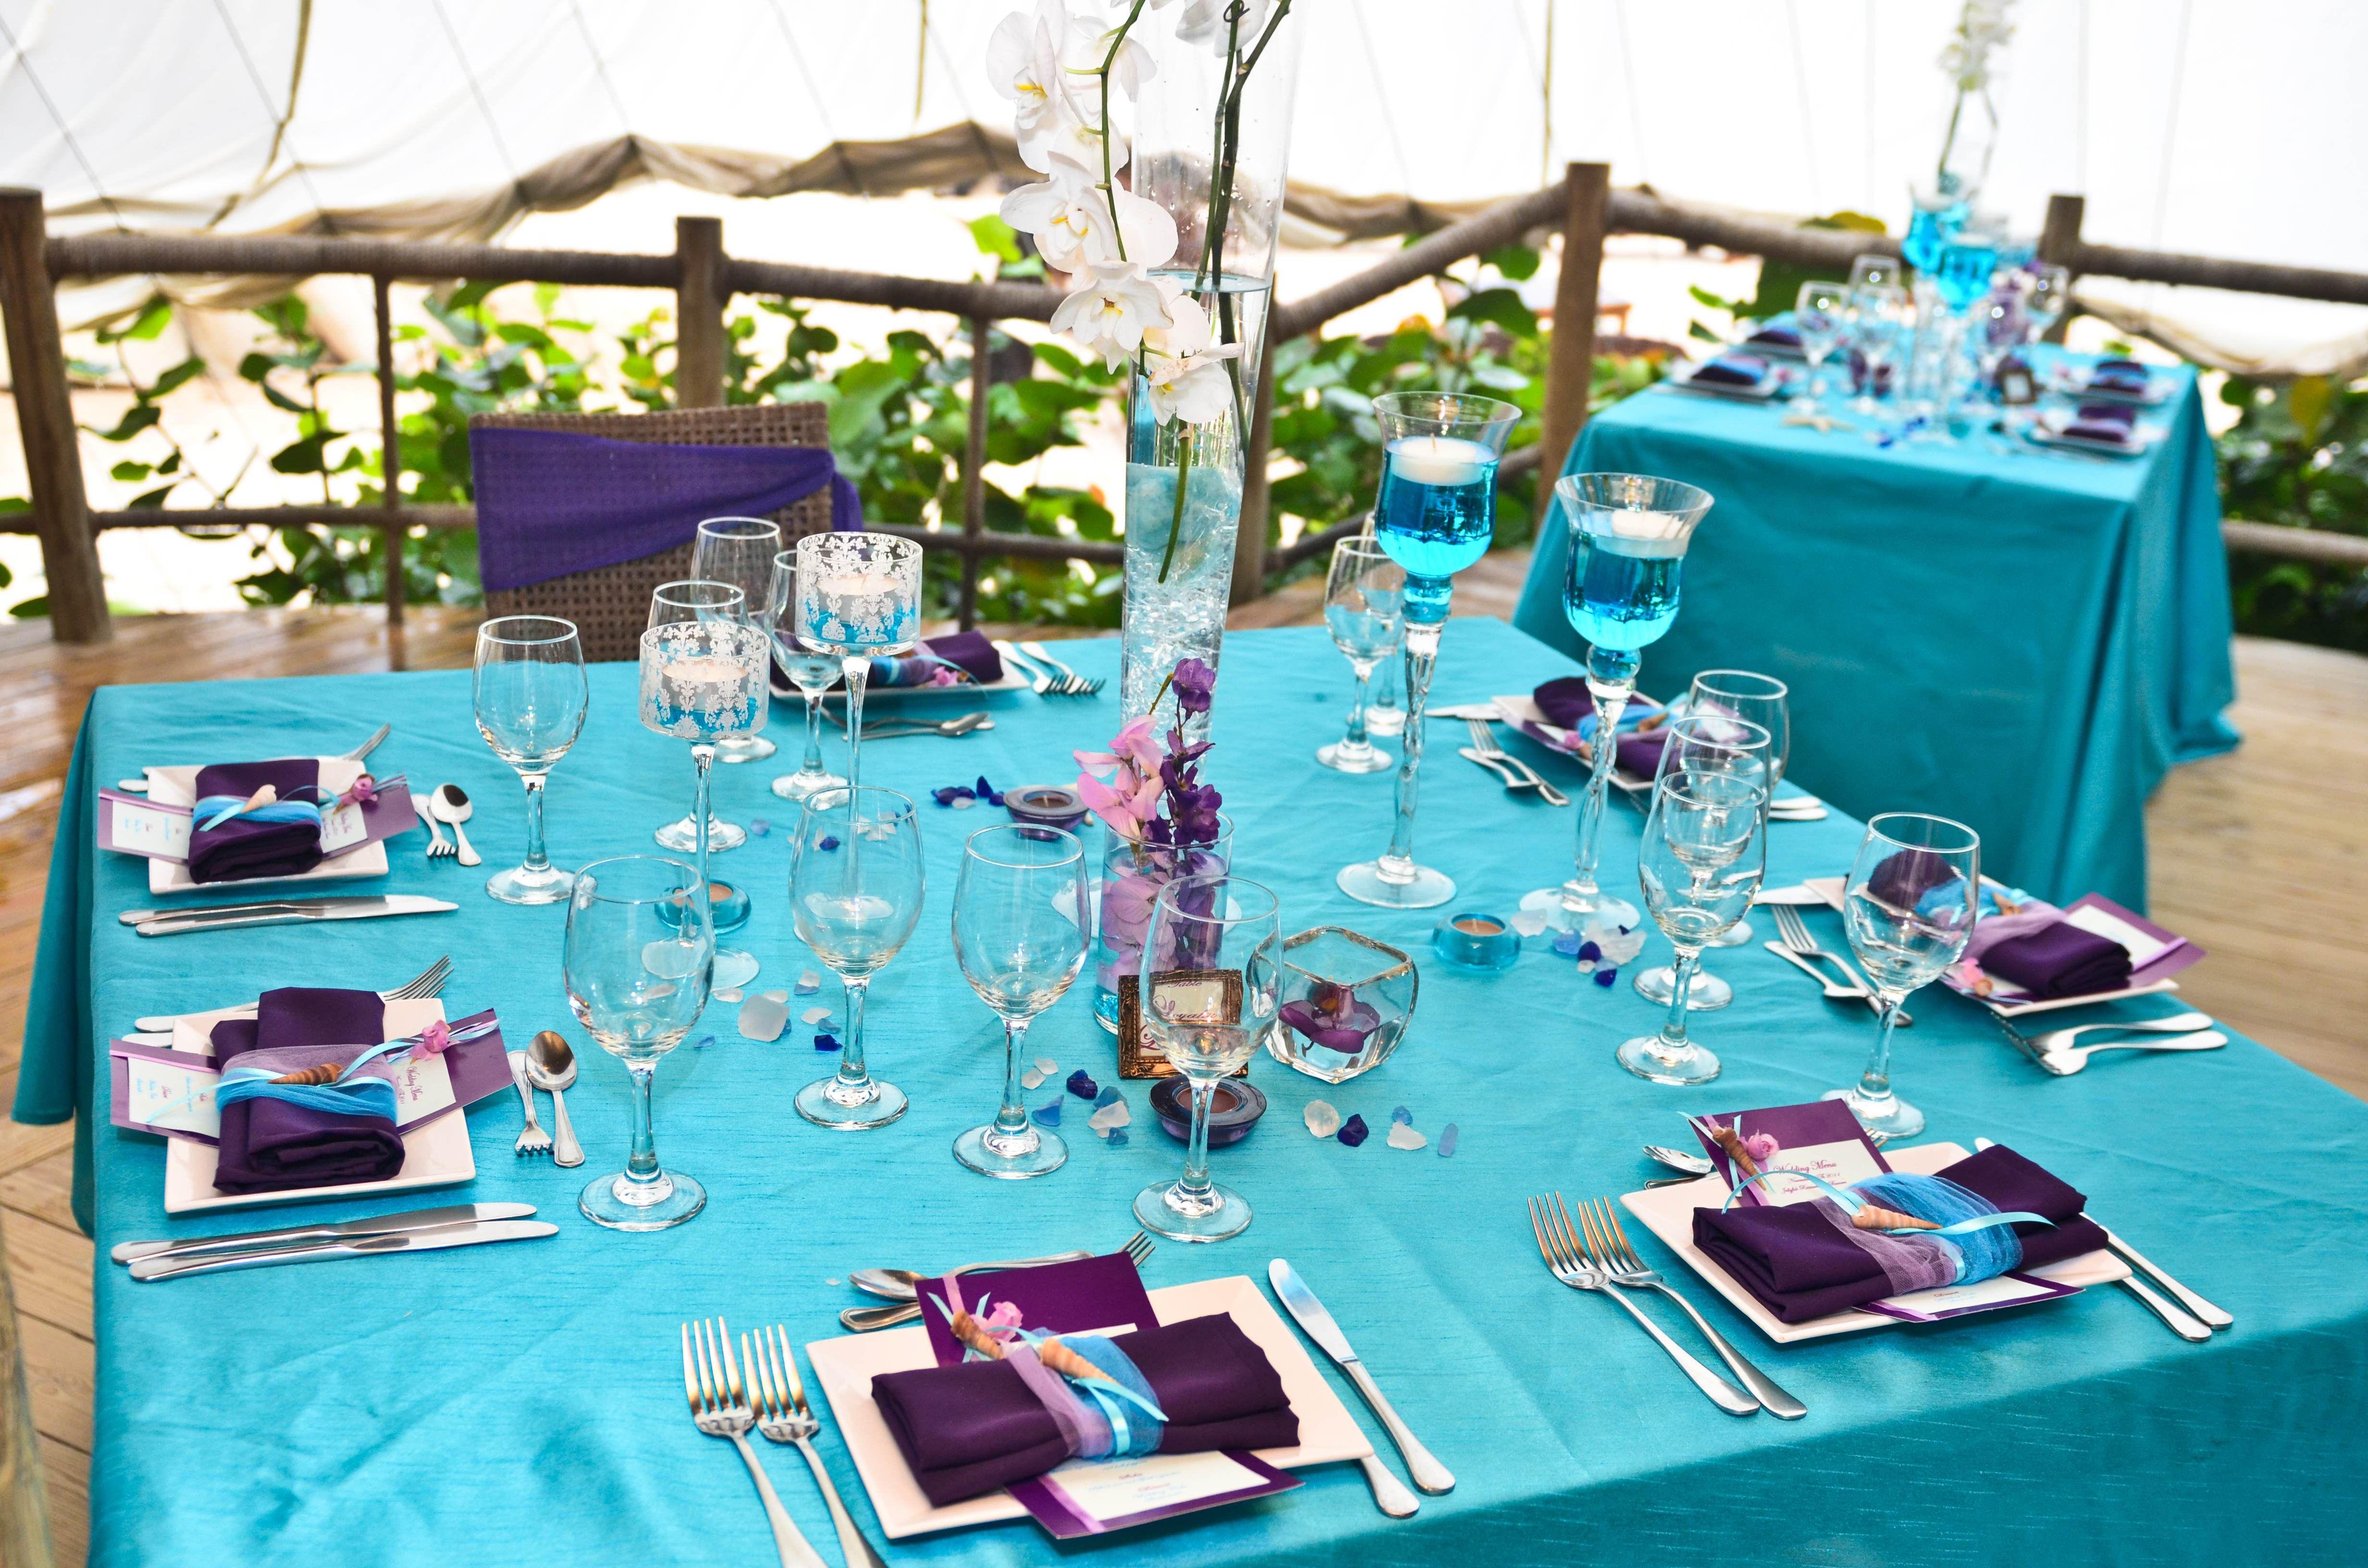 Teal And Purple Wedding Ideas: Teal Wedding By Lorraine Howlett On Pinterest